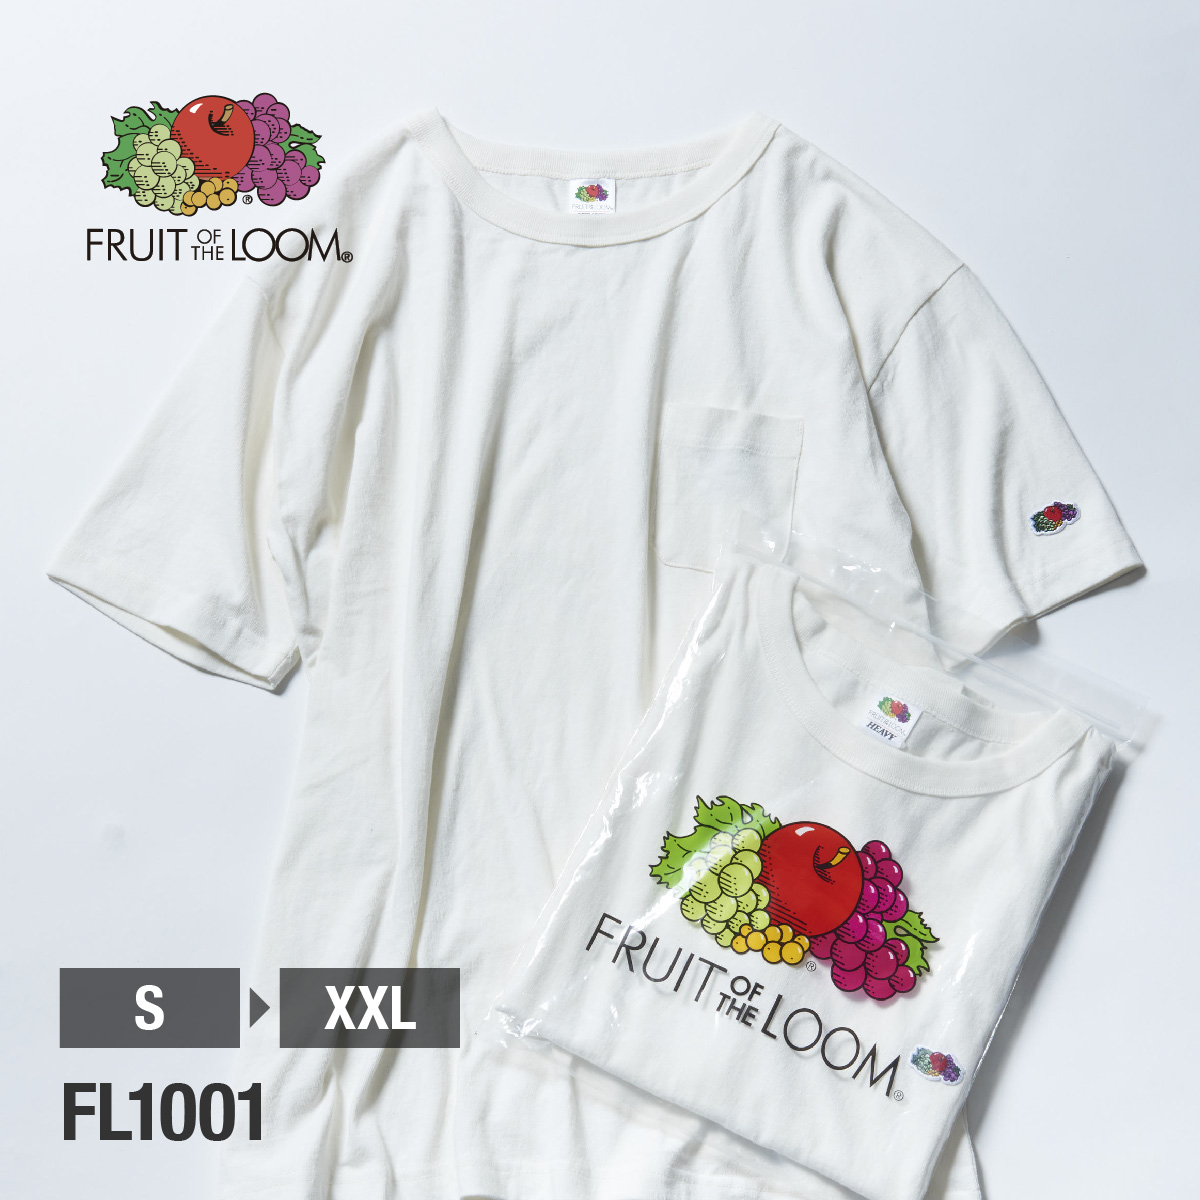 48 FRUIT OF THE LOOM HEAVY BLACK T SHIRTS 12 X S//M//L//XL